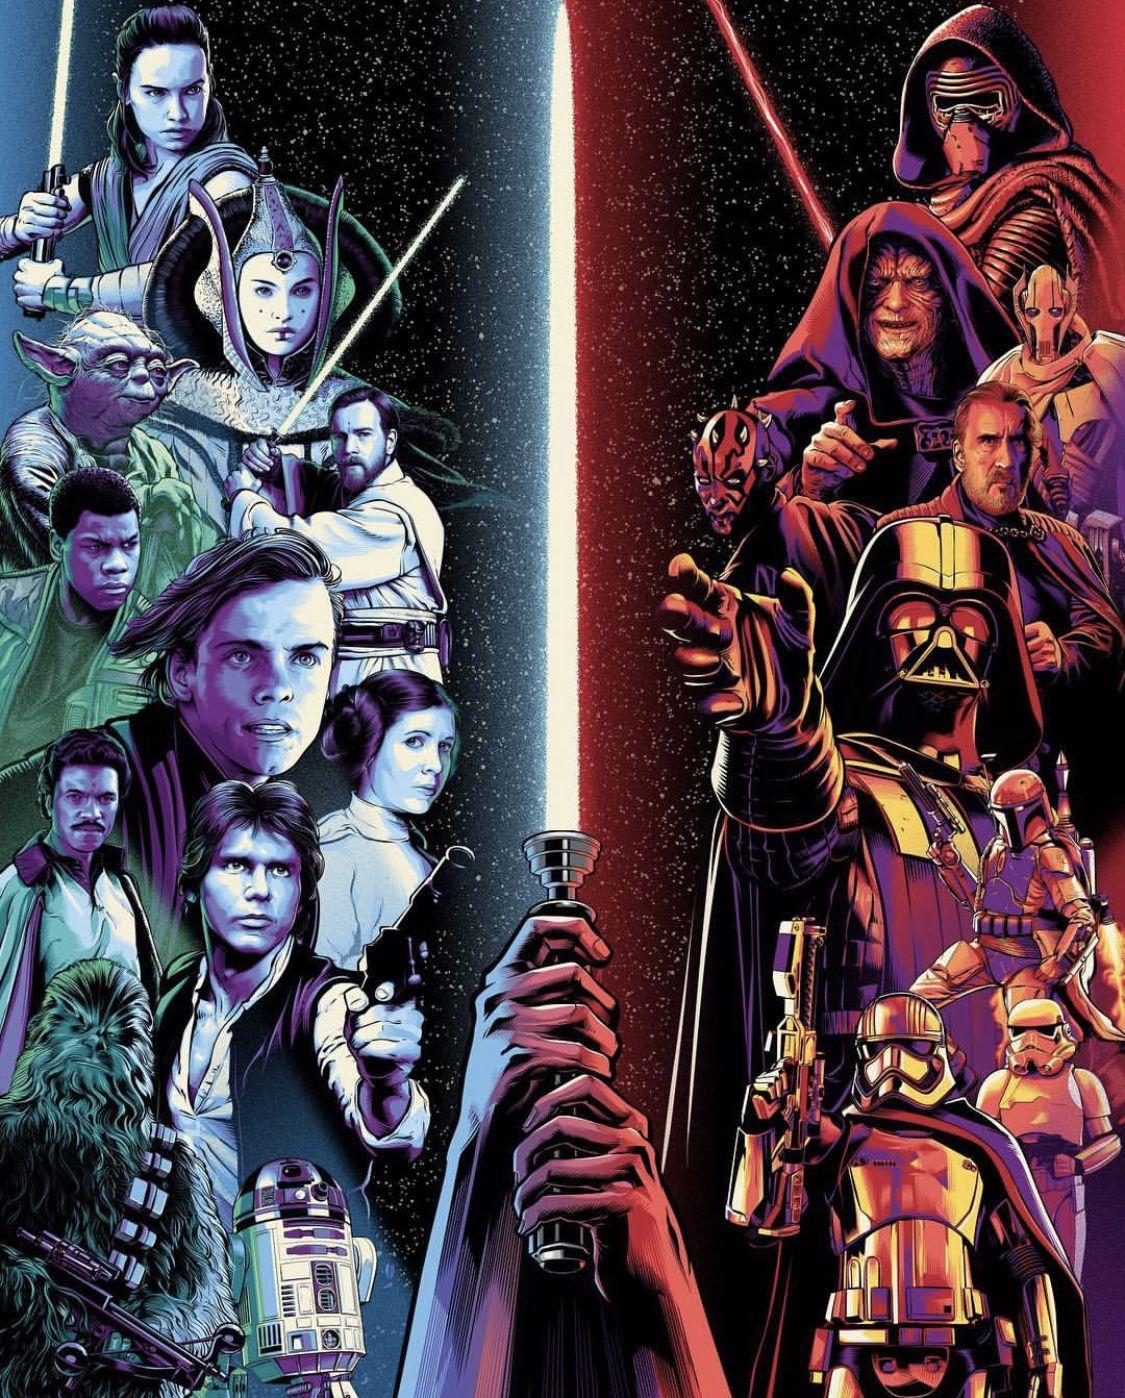 Everything Star Wars Yourestuckwithmeskyguy Star Wars Painting Star Wars Awesome Star Wars Background